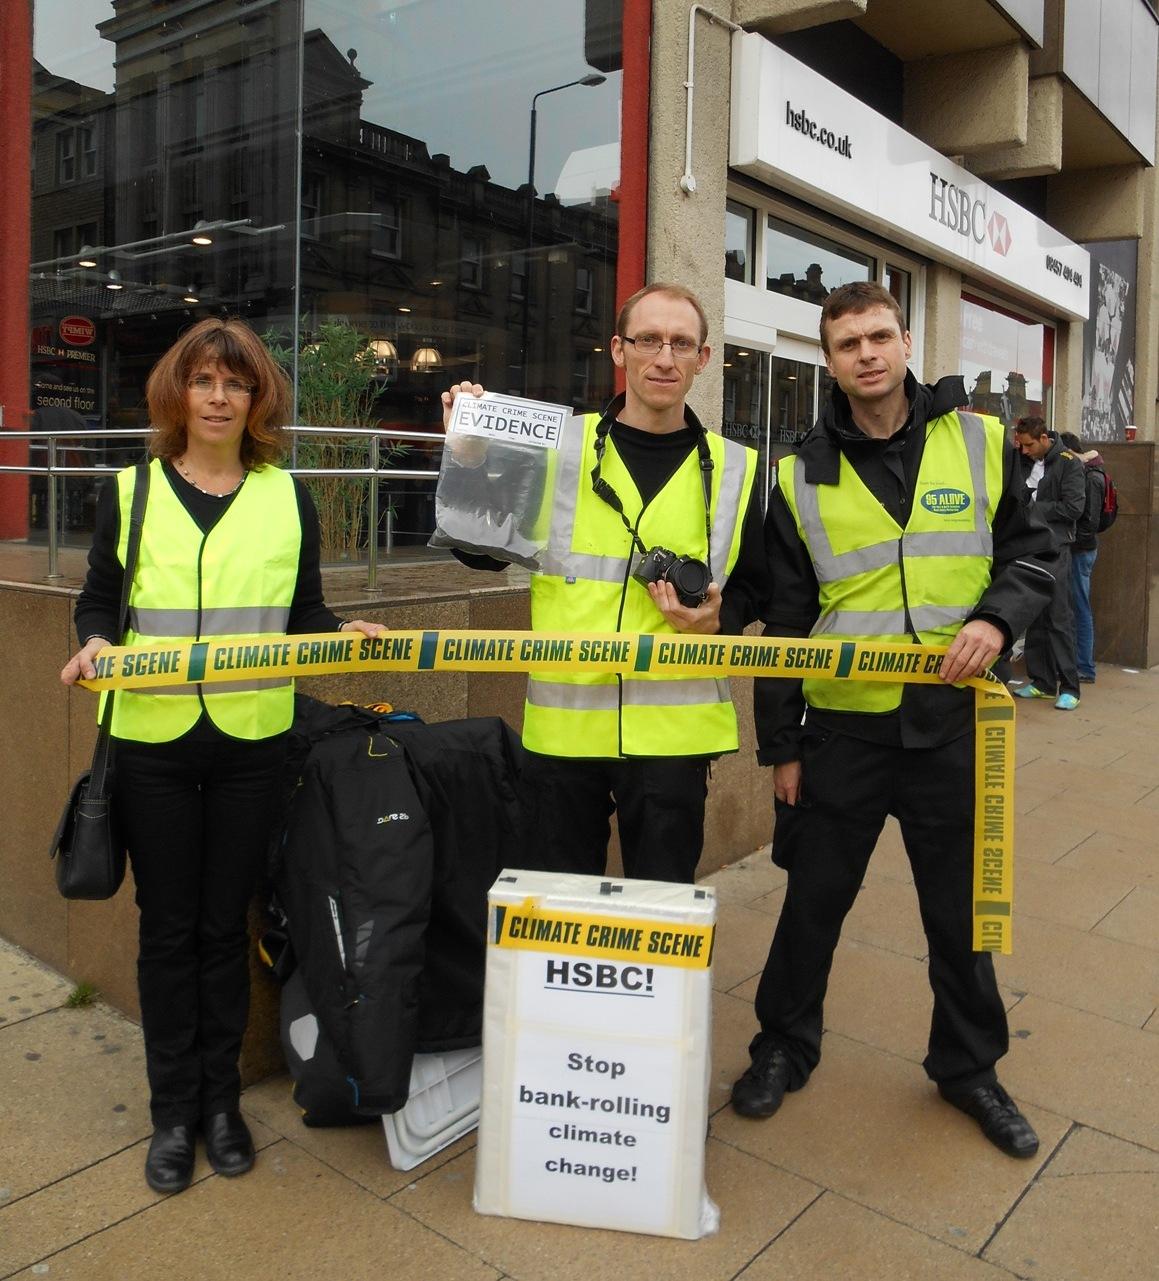 Crime scene': HSBC funds climate change